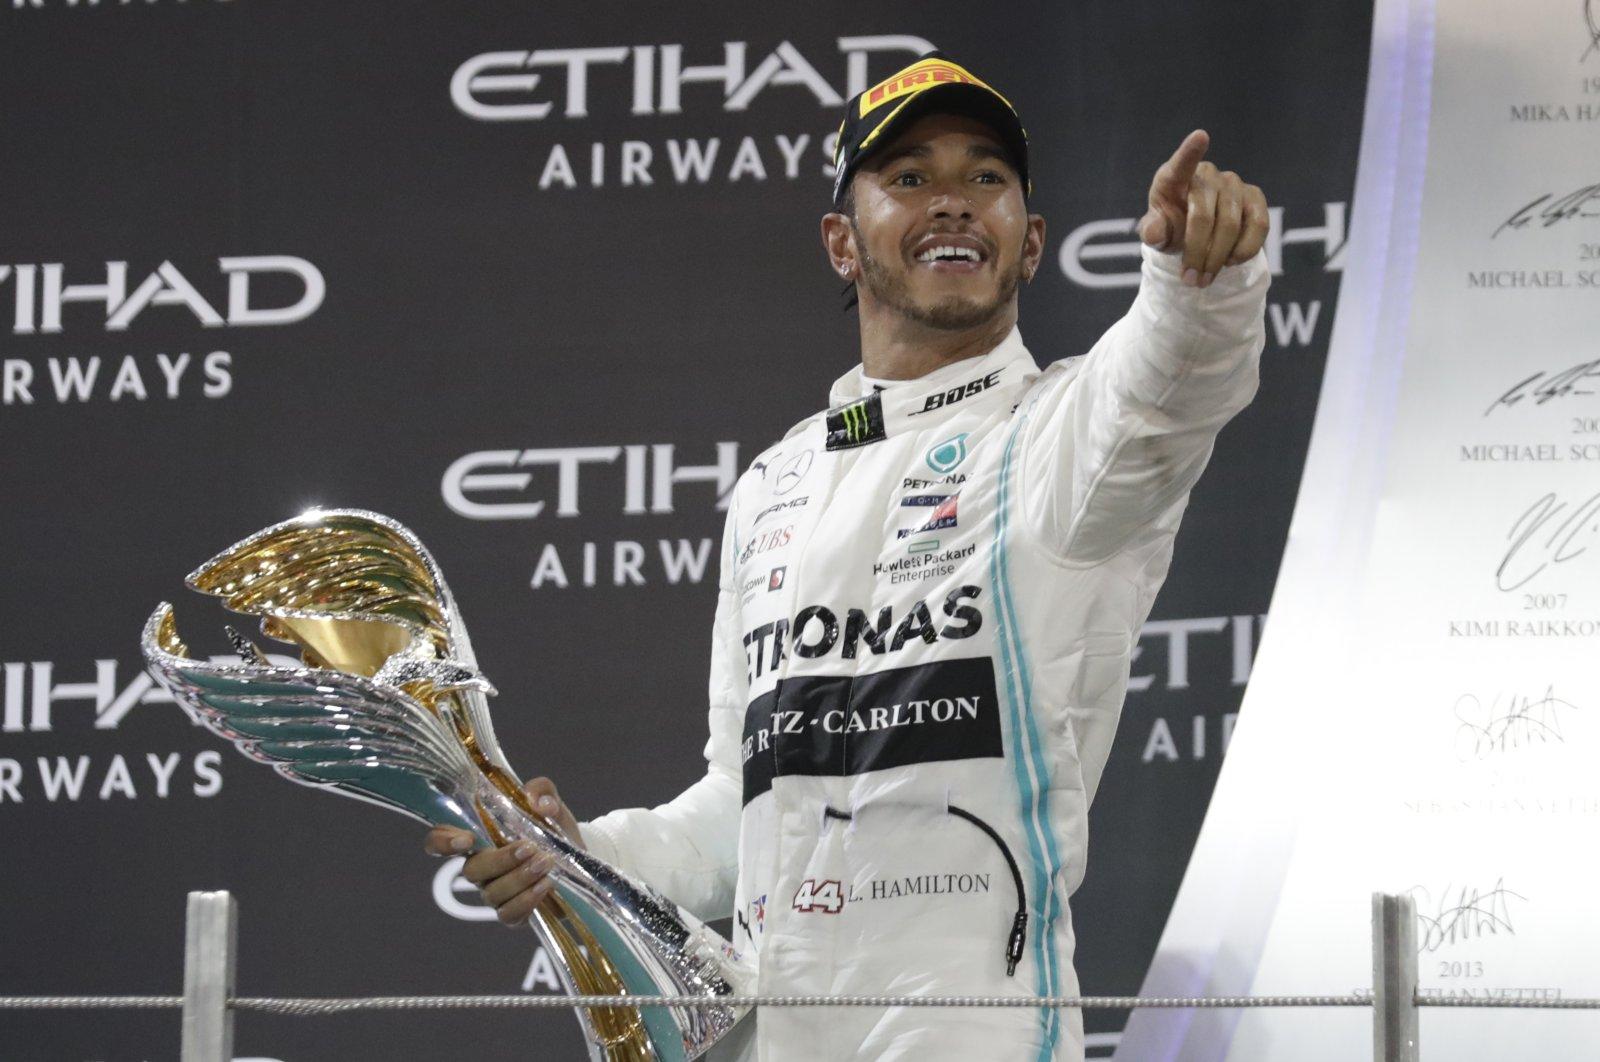 Lewis Hamilton celebrates after winning the Emirates F1 GP in Abu Dhabi, UAE, Dec.1, 2019. (AP Photo)